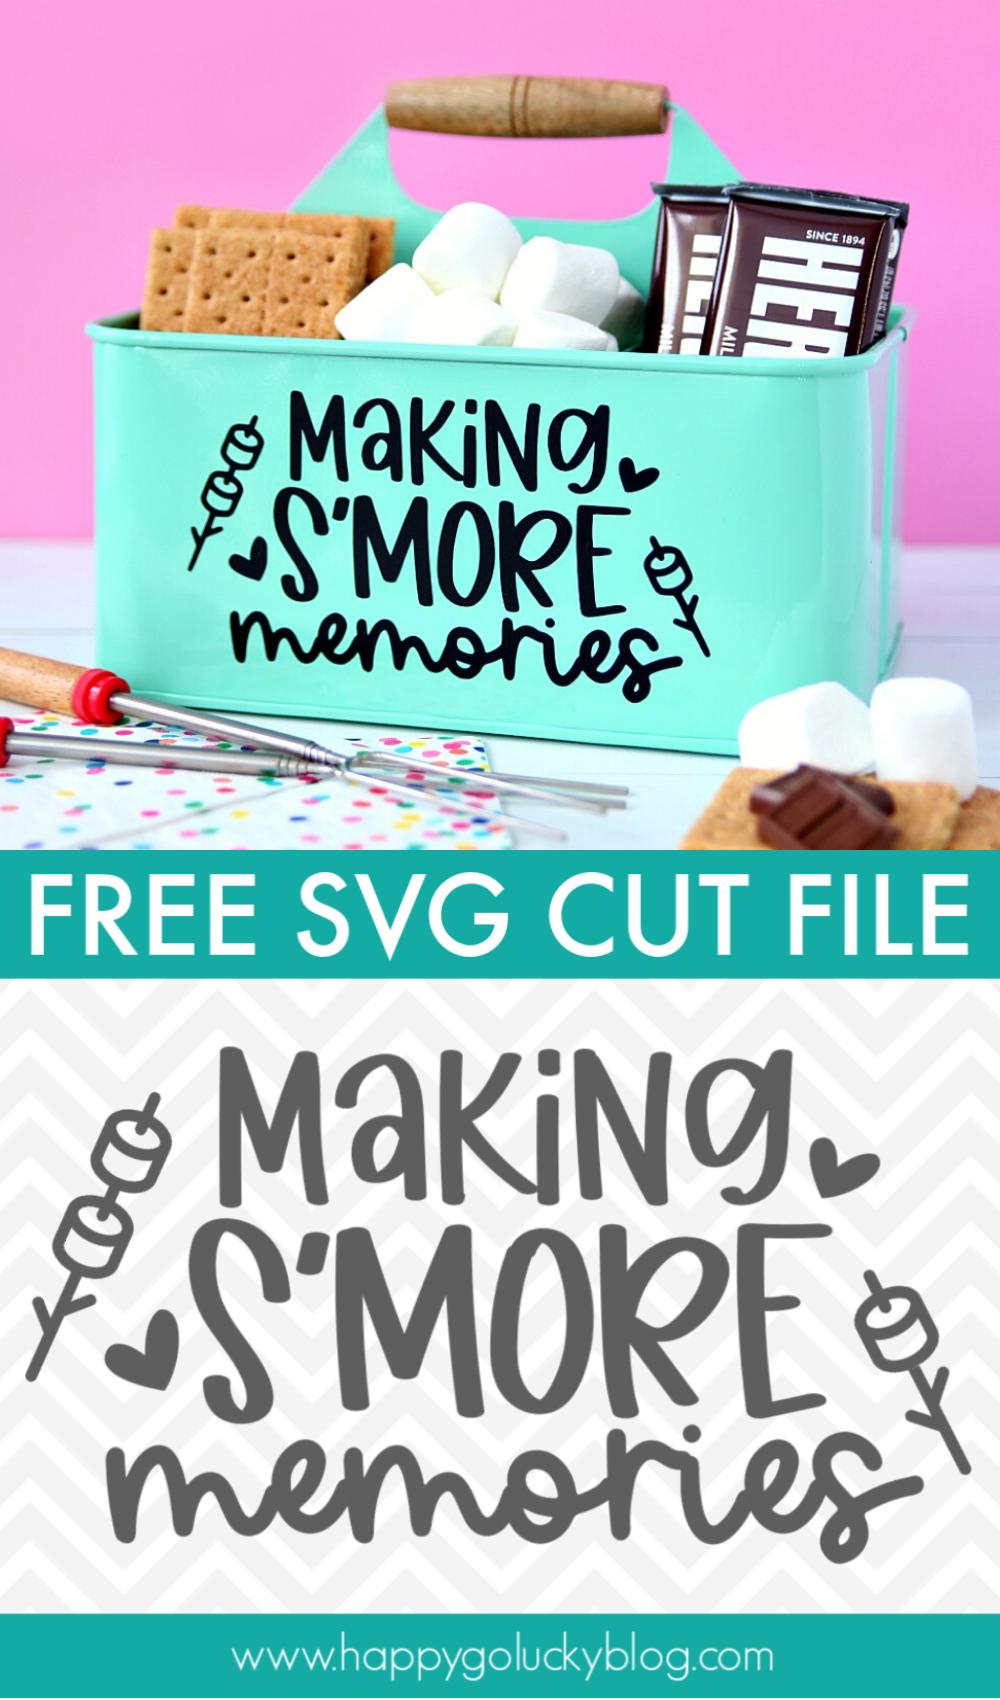 Making S'more Memories SVG